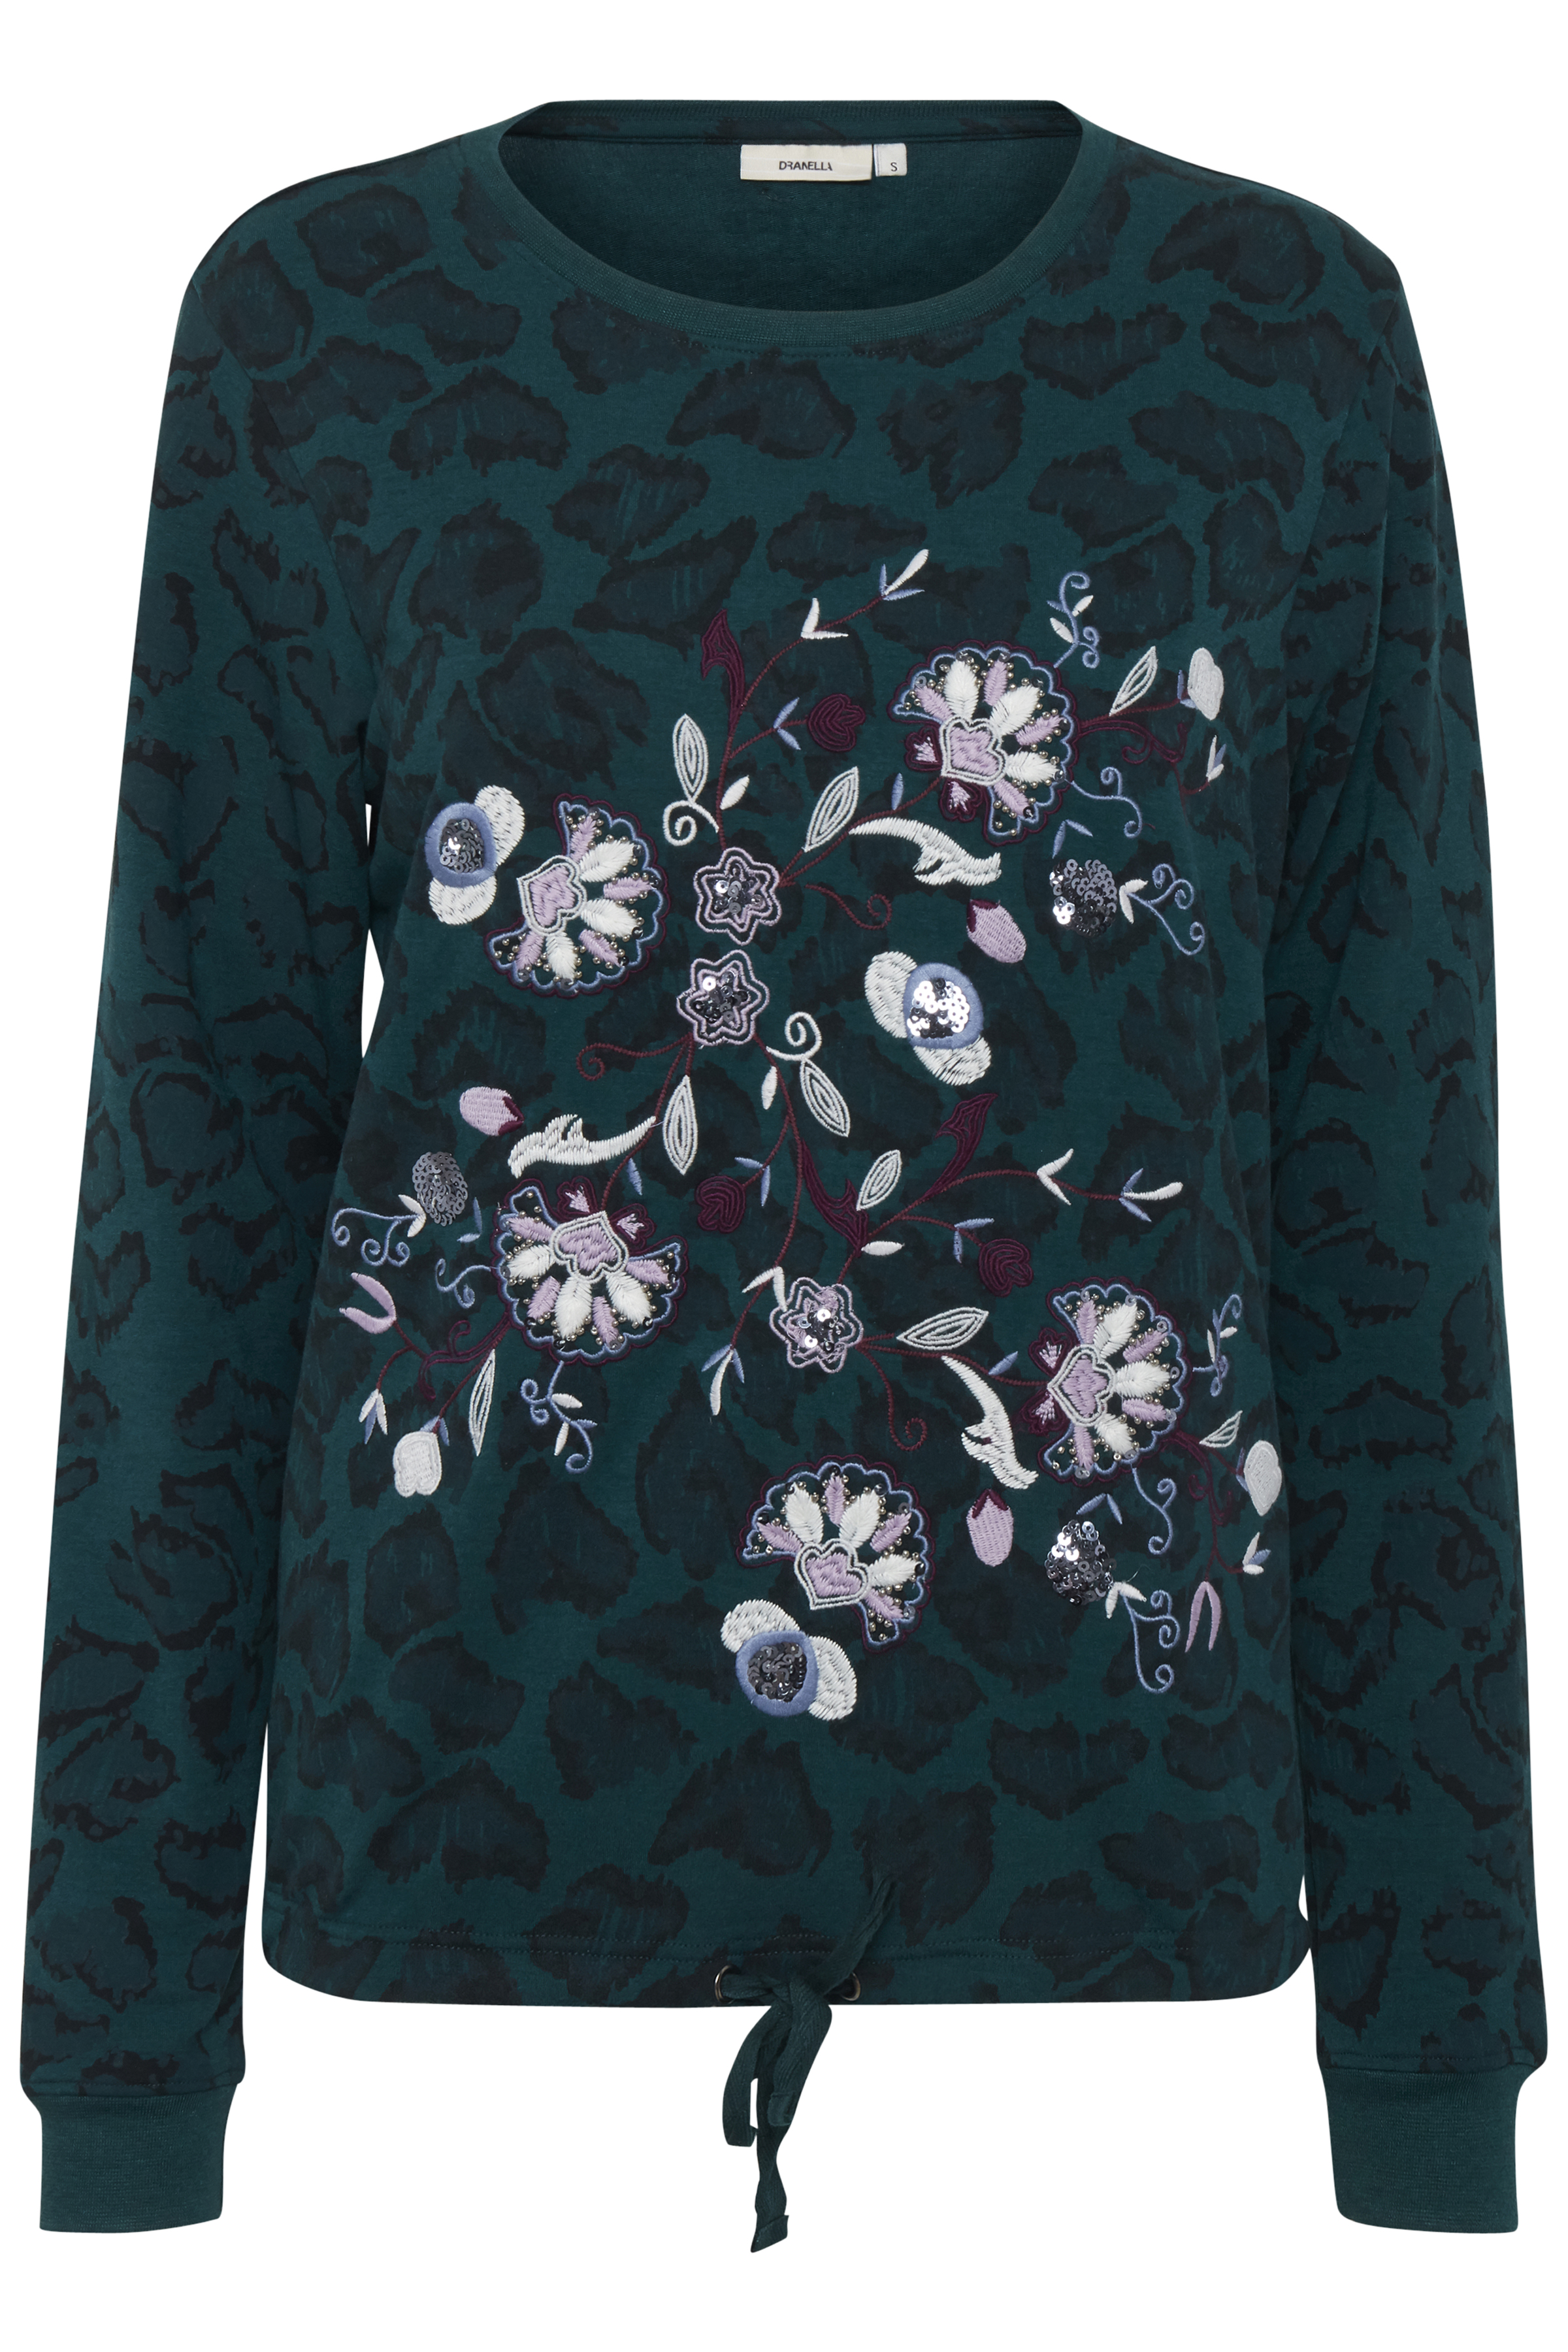 Dranella Dame Sweatshirt - Flaskegrøn/lilla